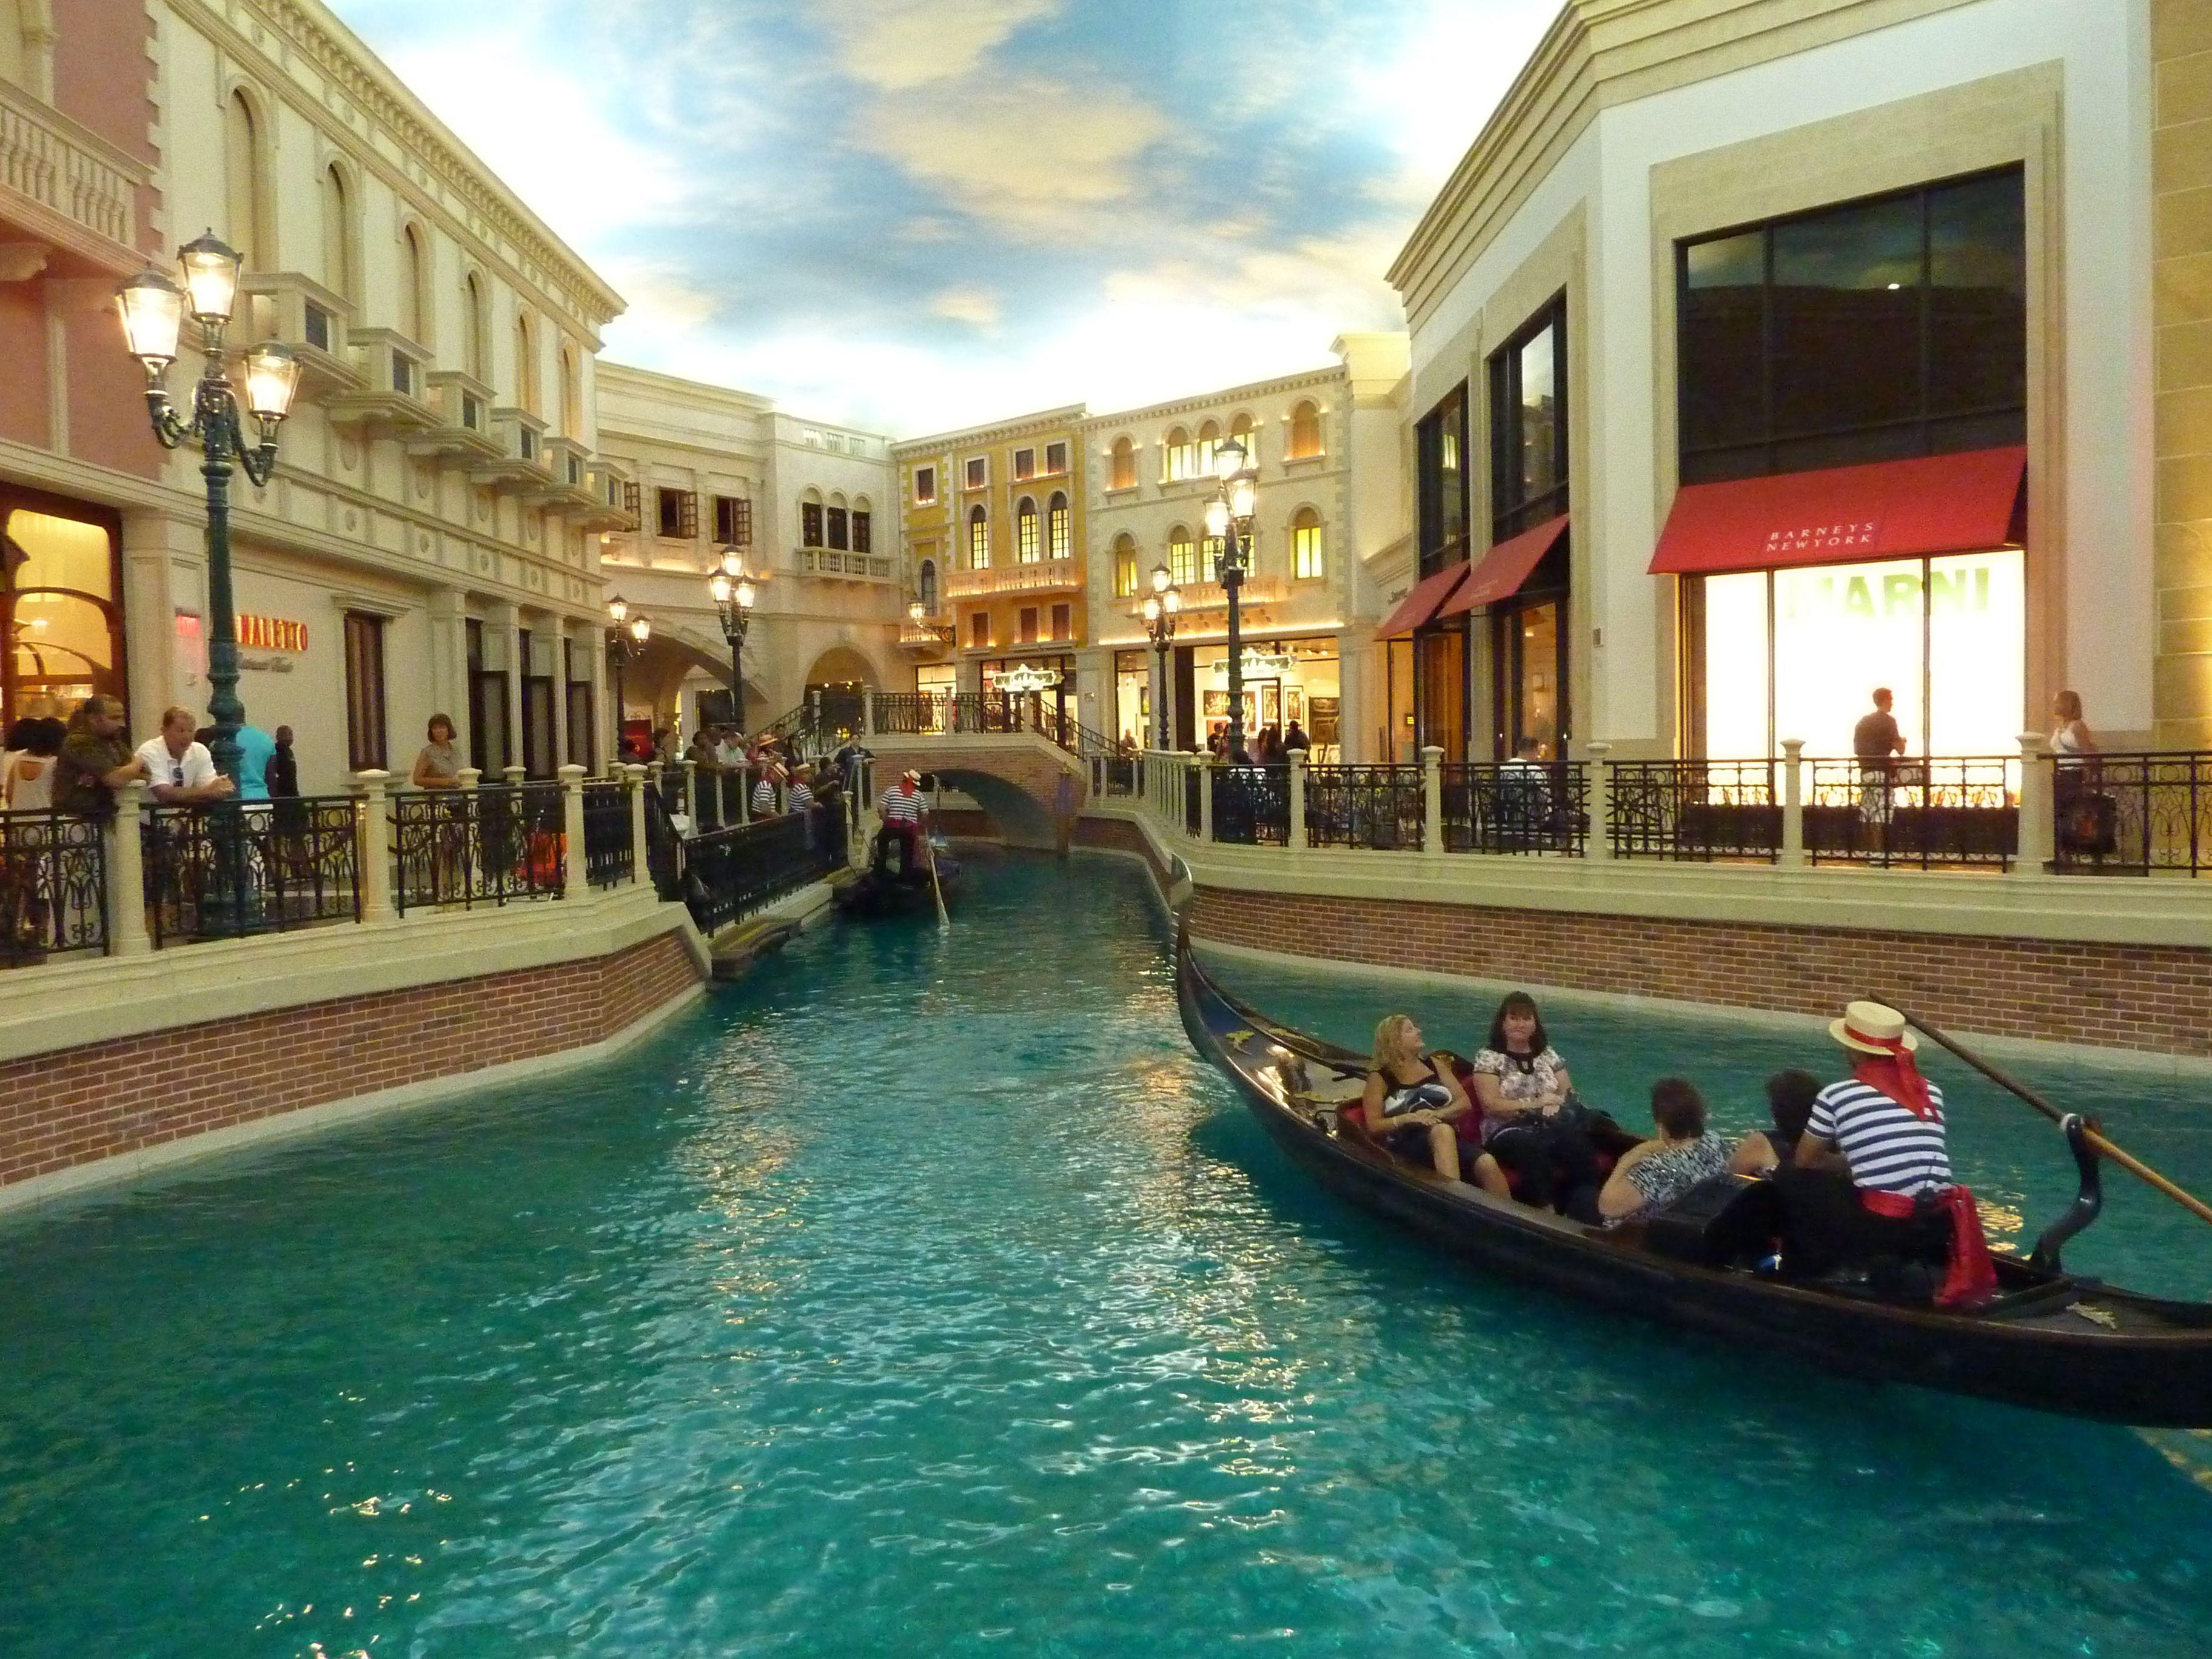 Usa 209 Nevada Las Vegas El Culto A La: The Venetian Las Vegas Casino, Hotel & Resort!